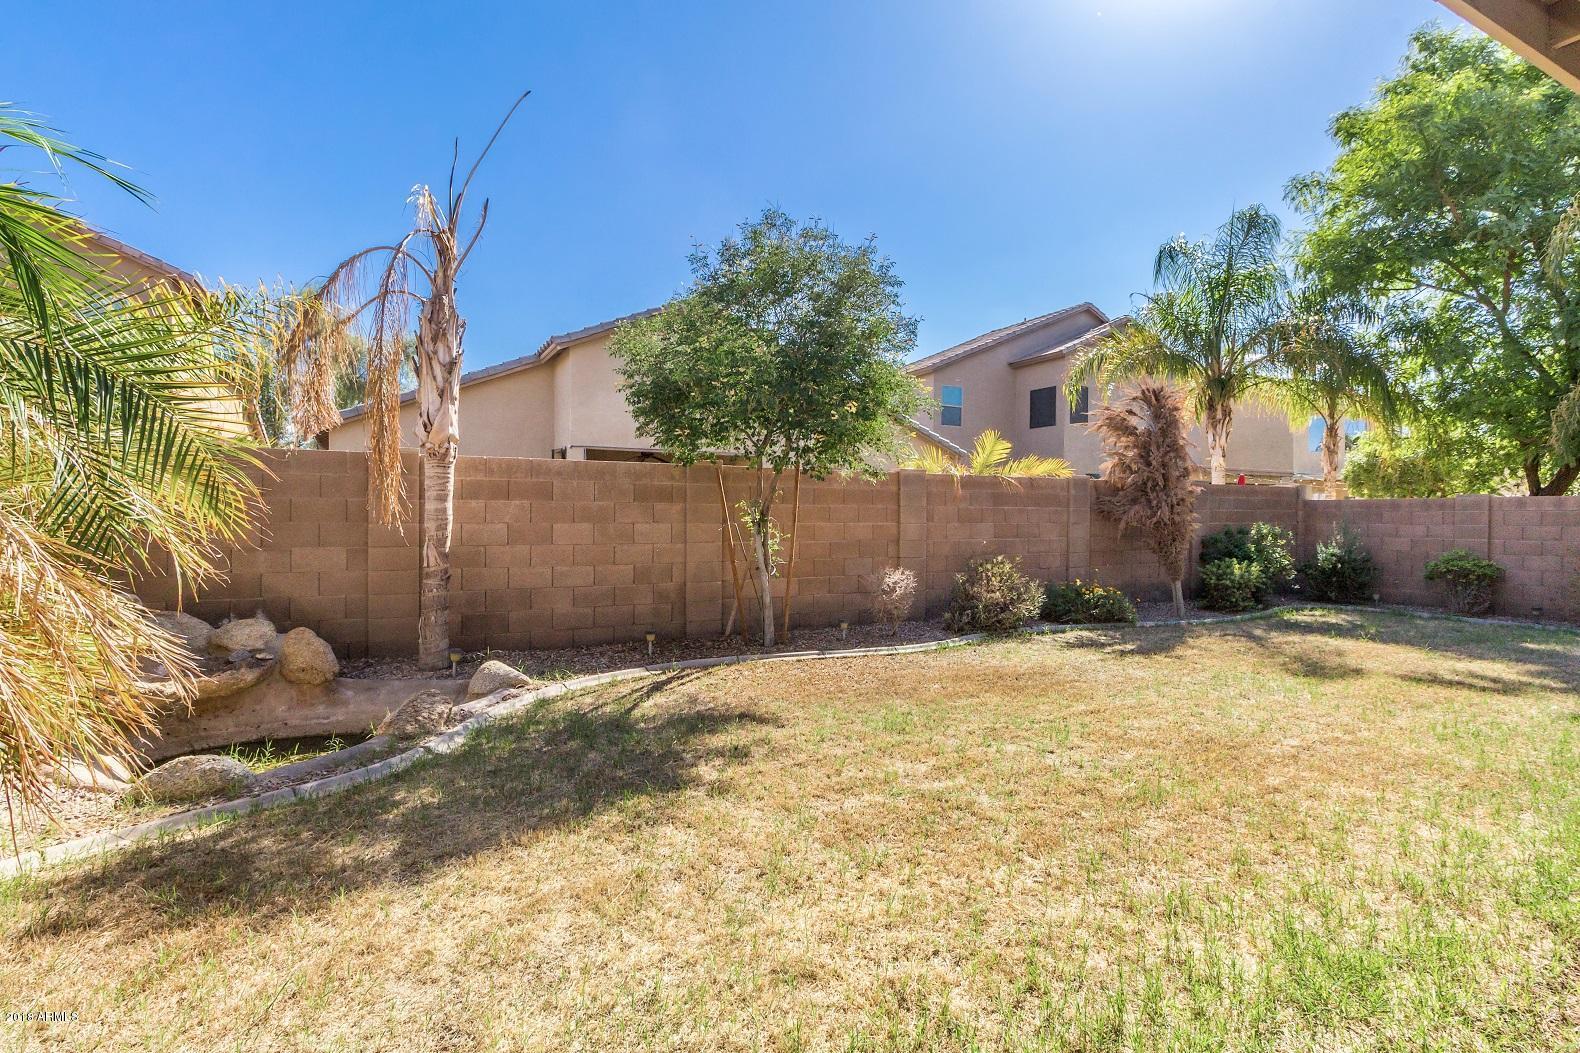 MLS 5826465 46107 W MORNING VIEW Lane, Maricopa, AZ 85139 Maricopa AZ Maricopa Meadows